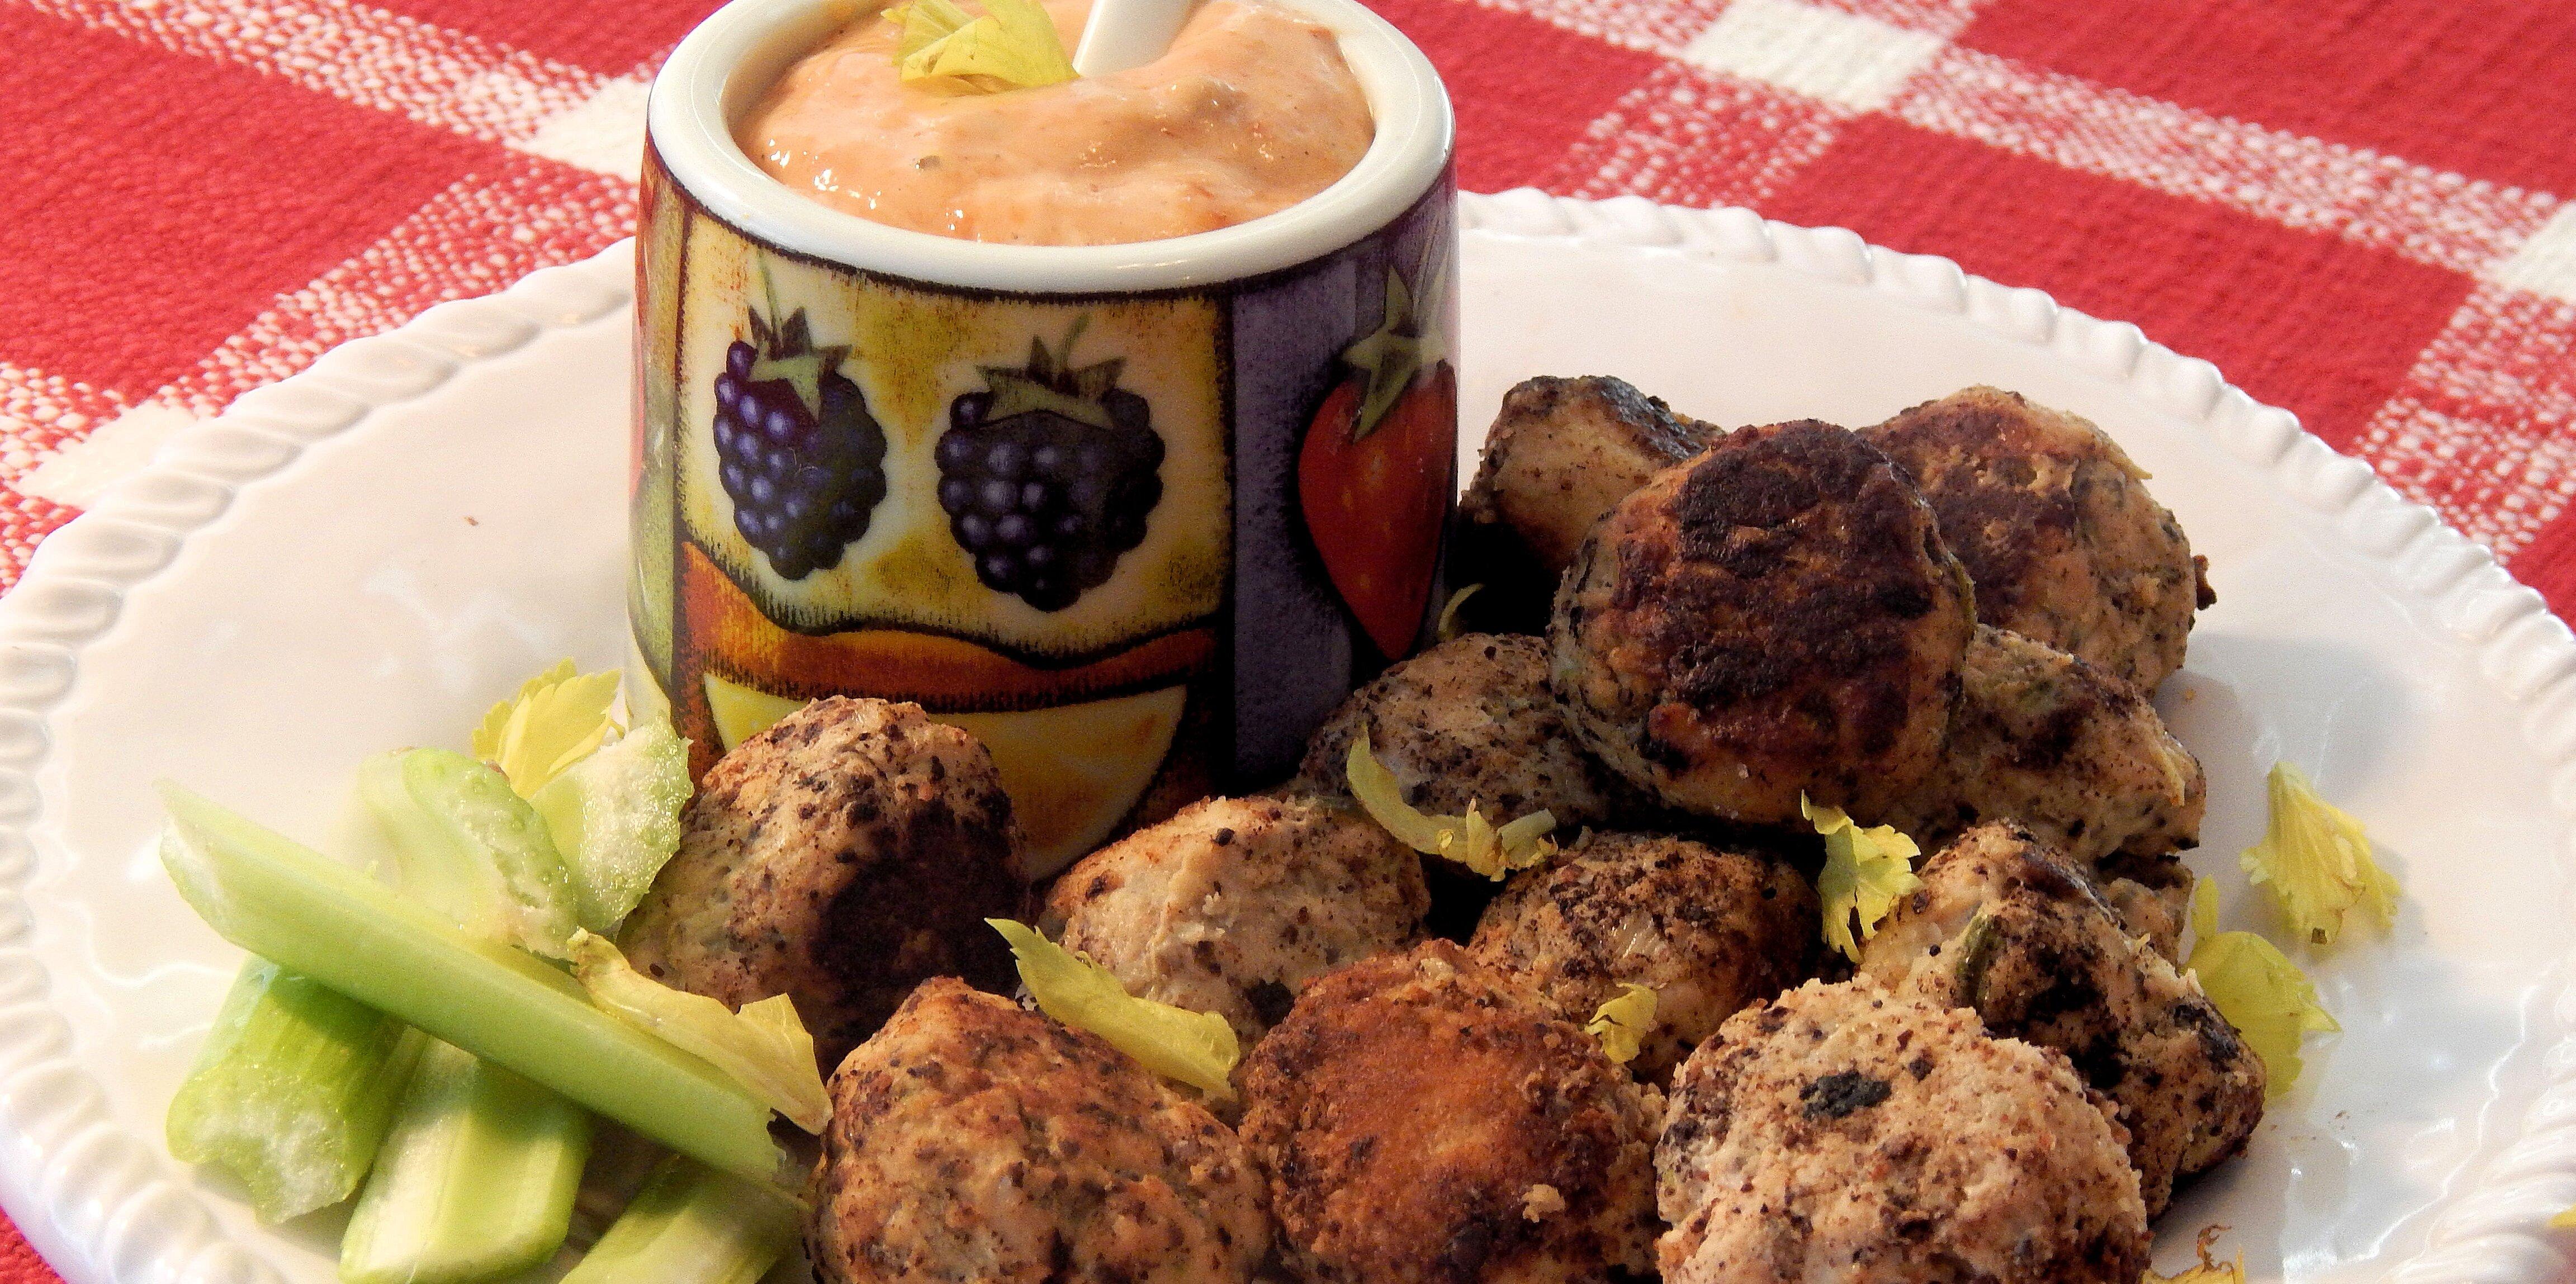 ground chicken patties or meatballs recipe